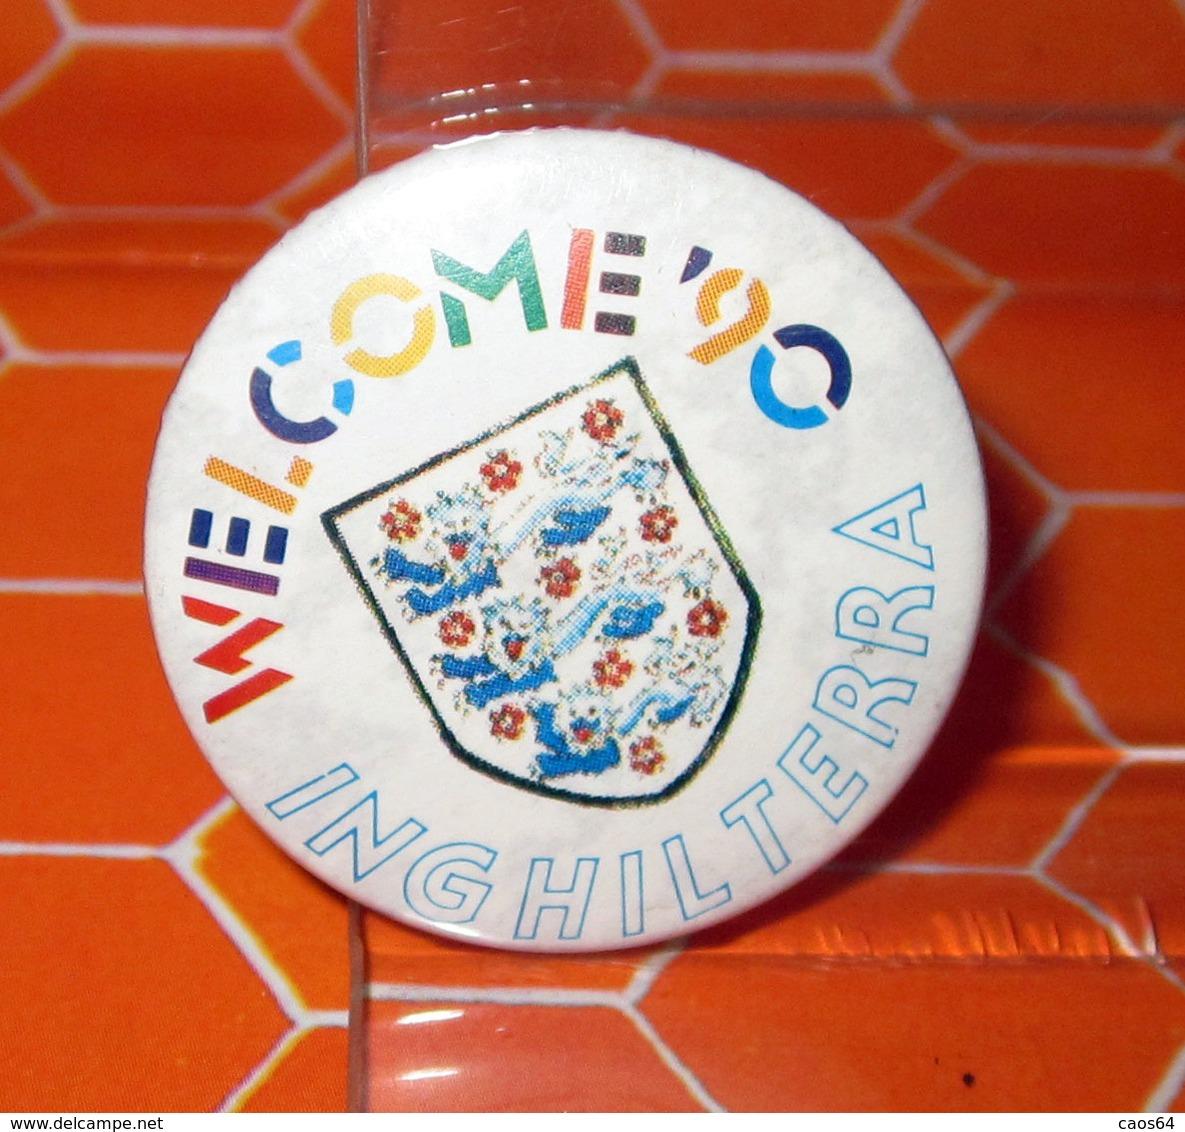 WELCOME '90 INGHILTERRA MONDIALI CALCIO ITALIA '90 PIN SPILLA - Calcio